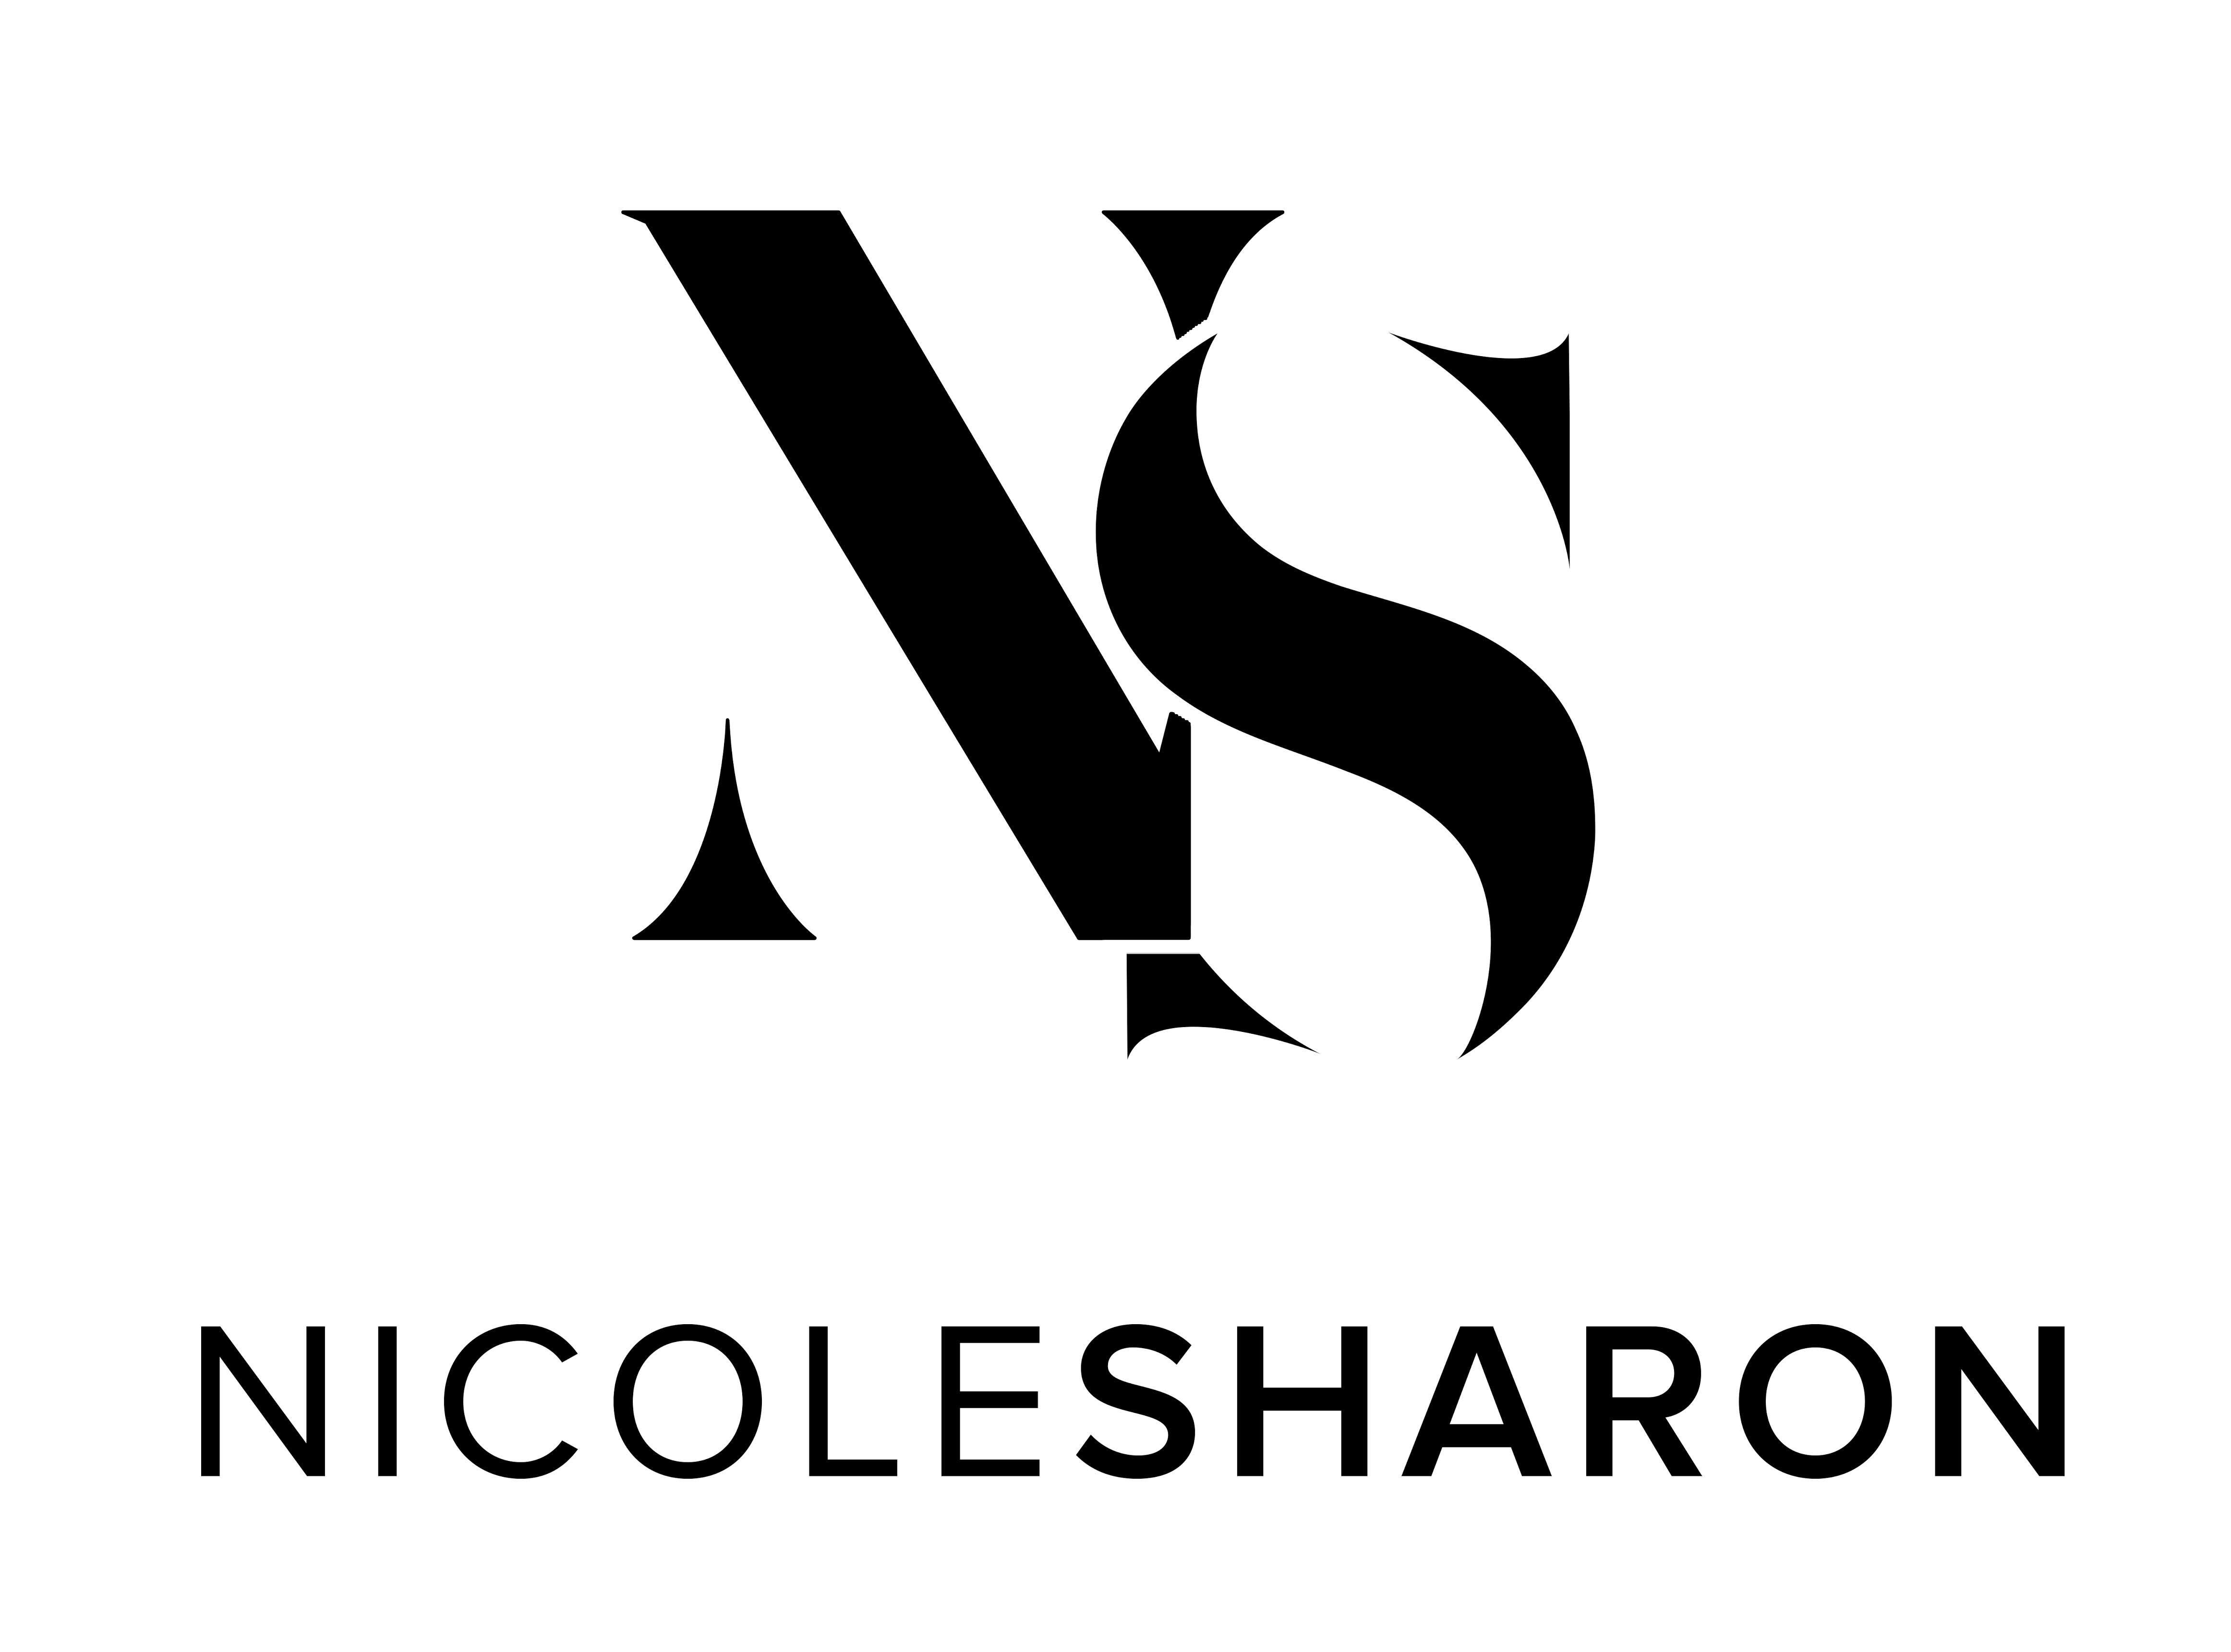 nicolesharonlogo_black